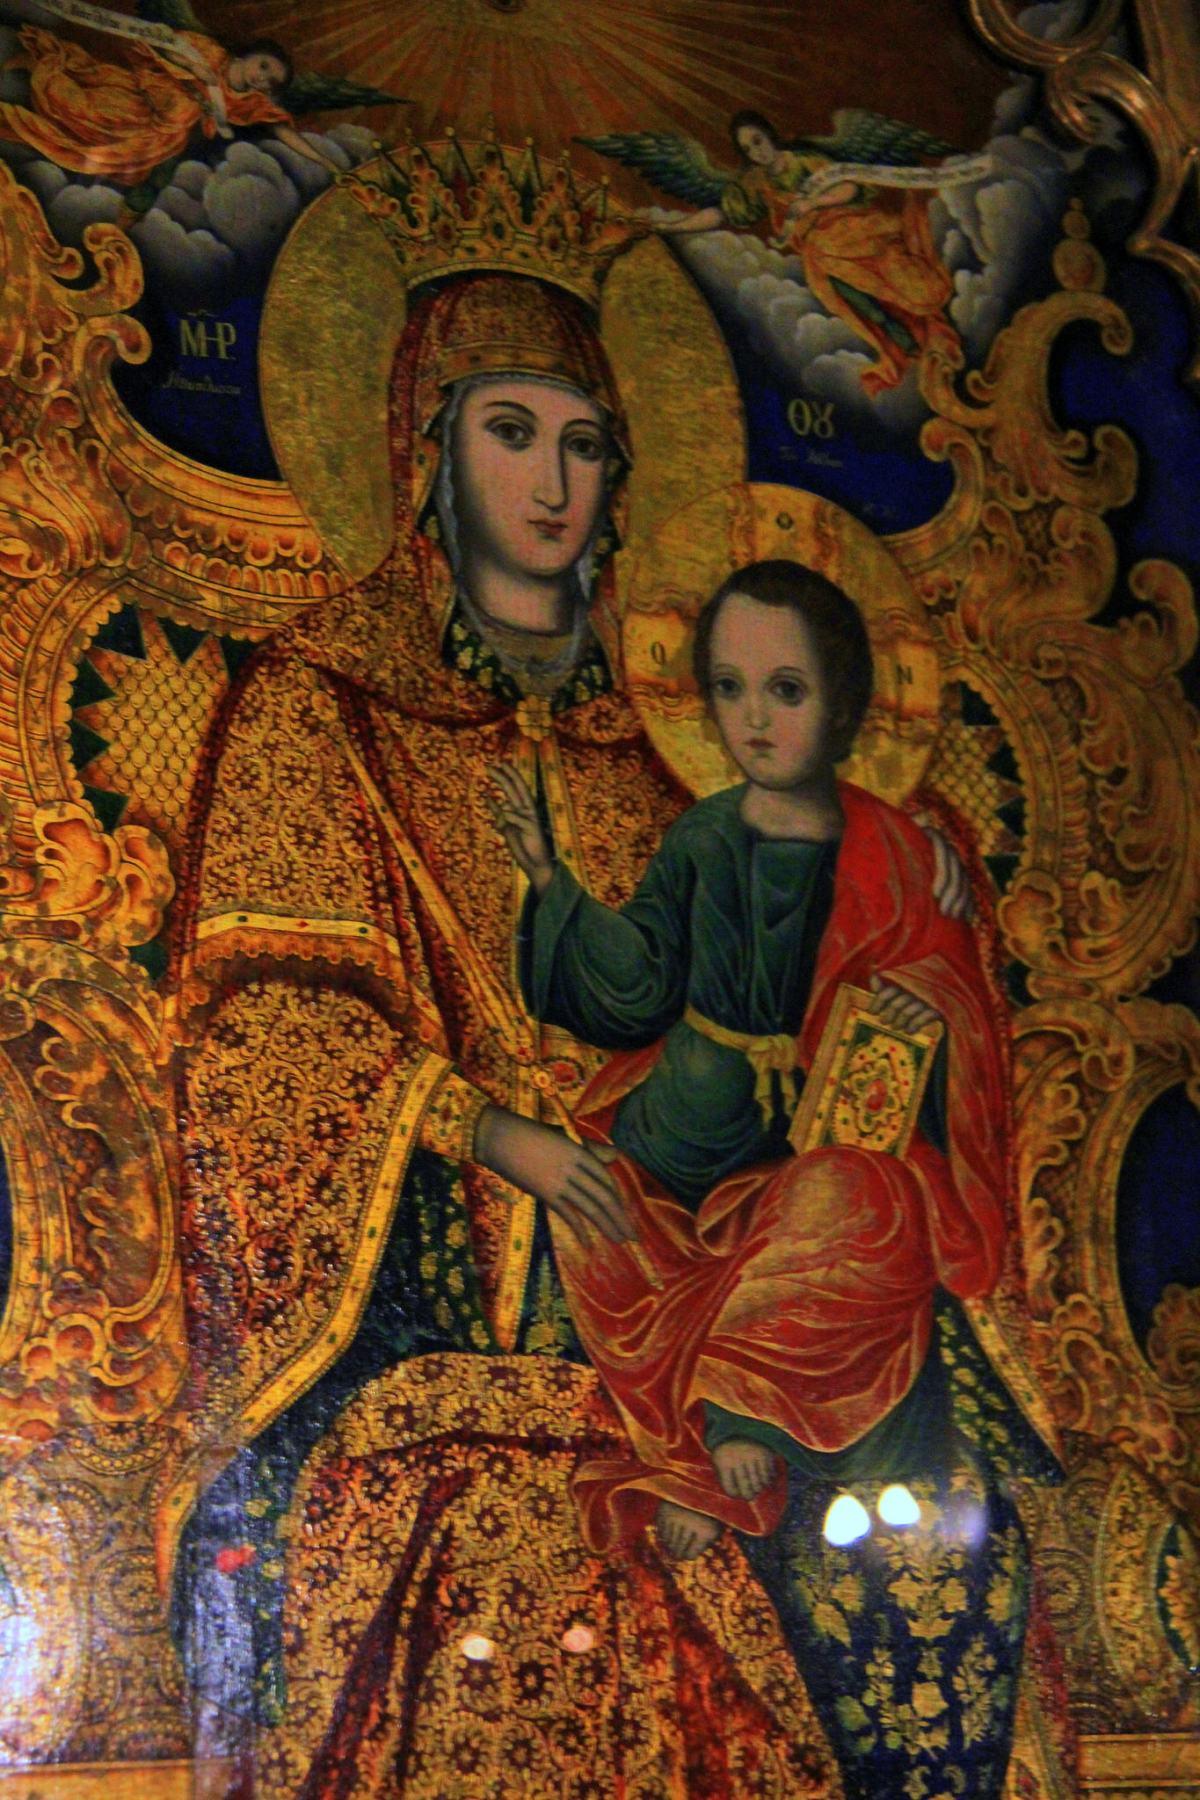 Frescoes at Stavropoleos Monastery in Bucharest Romania